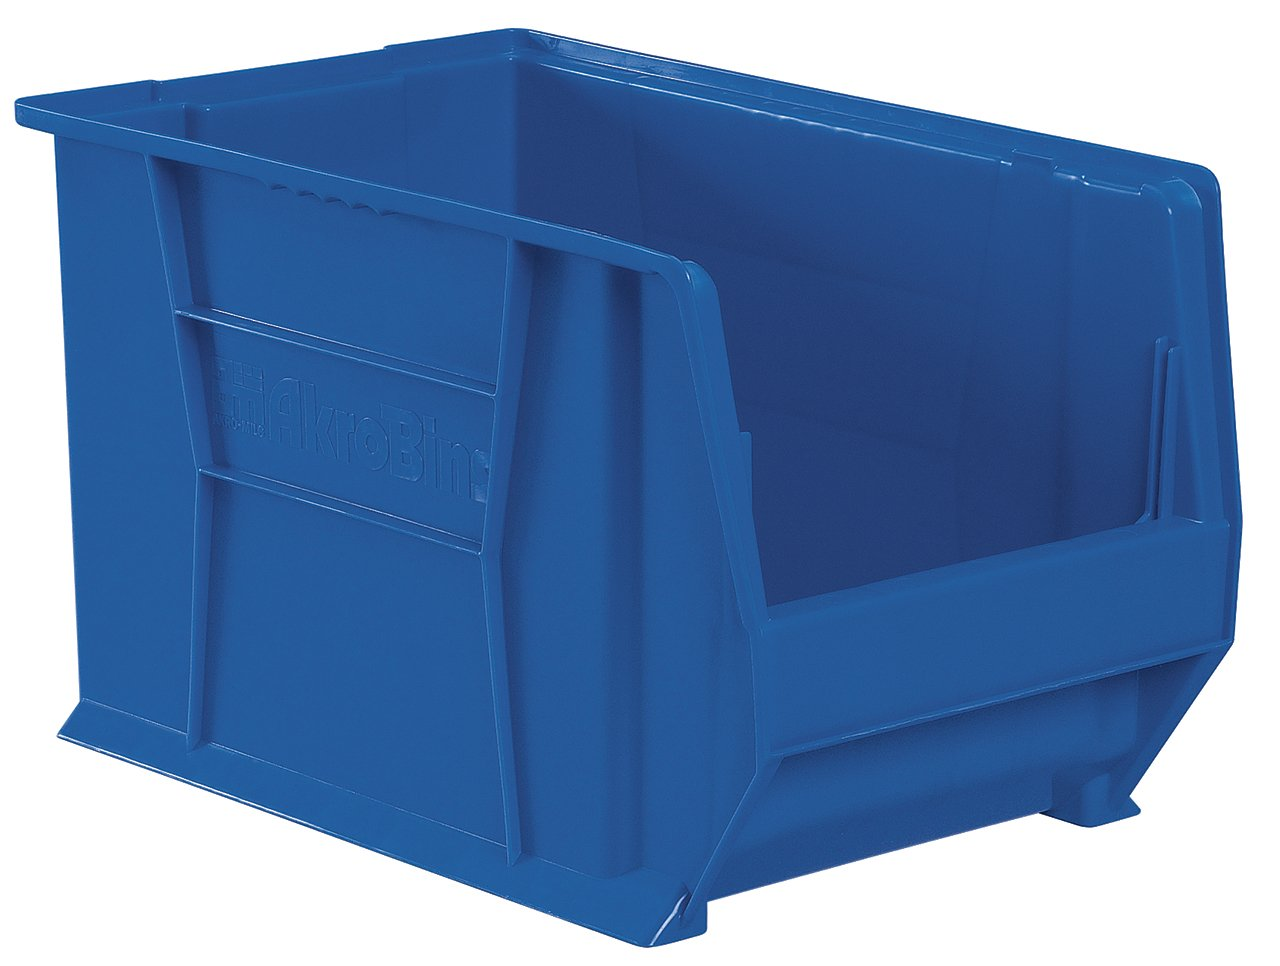 Akro-Mils 30282 20-Inch D by 12-Inch W by 12-Inch H Super Size Plastic Stacking Storage Akro Bin, Blue, Case of 2 by Akro-Mils